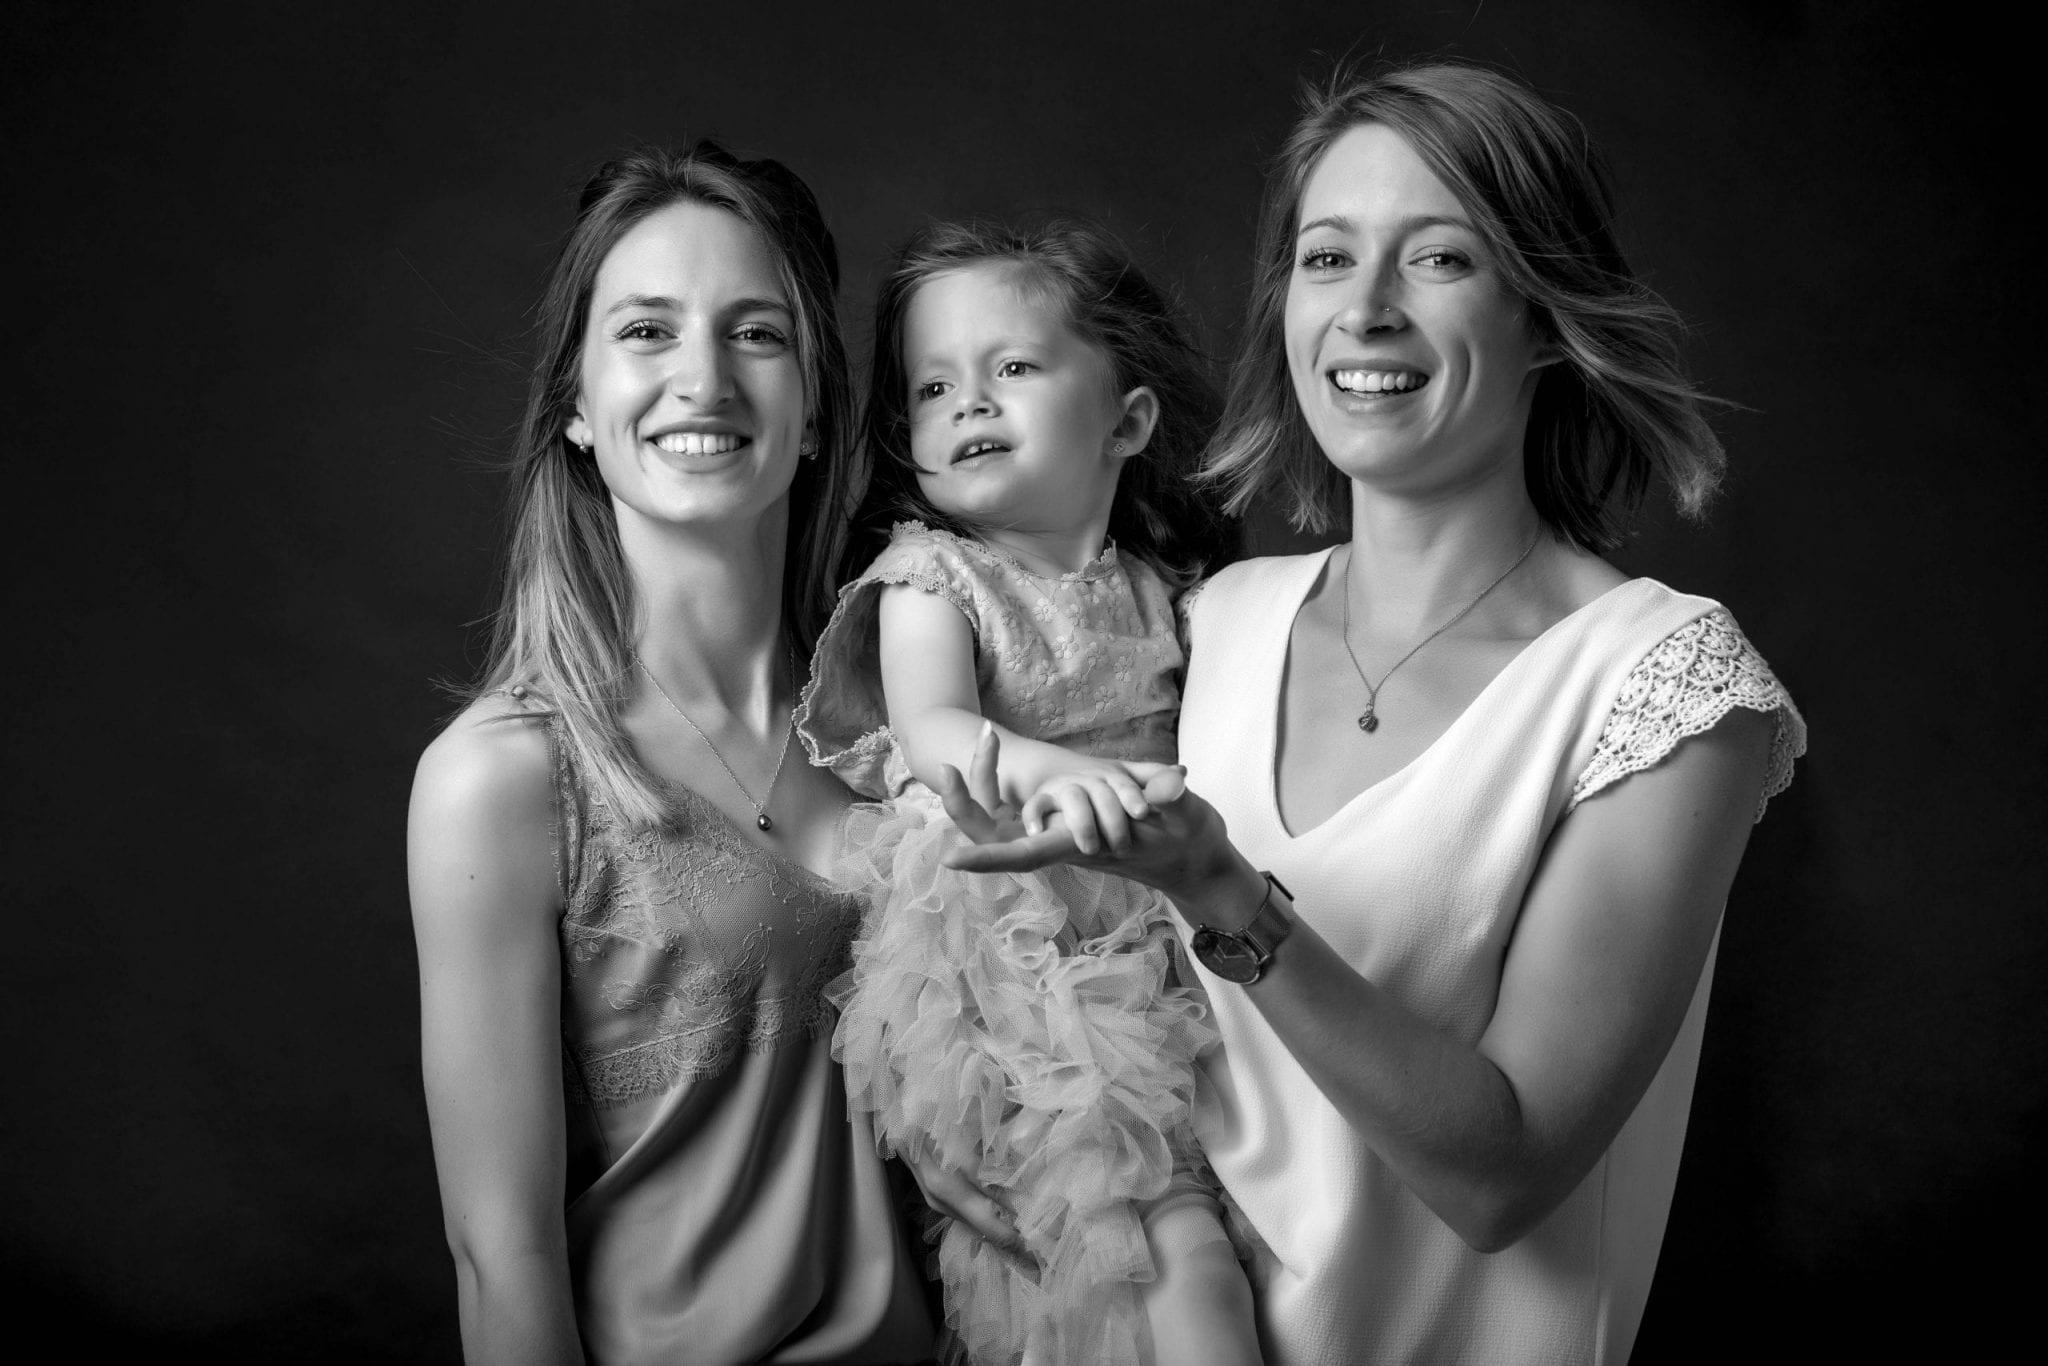 Studio END Naucelle en Aveyron Photo de famille